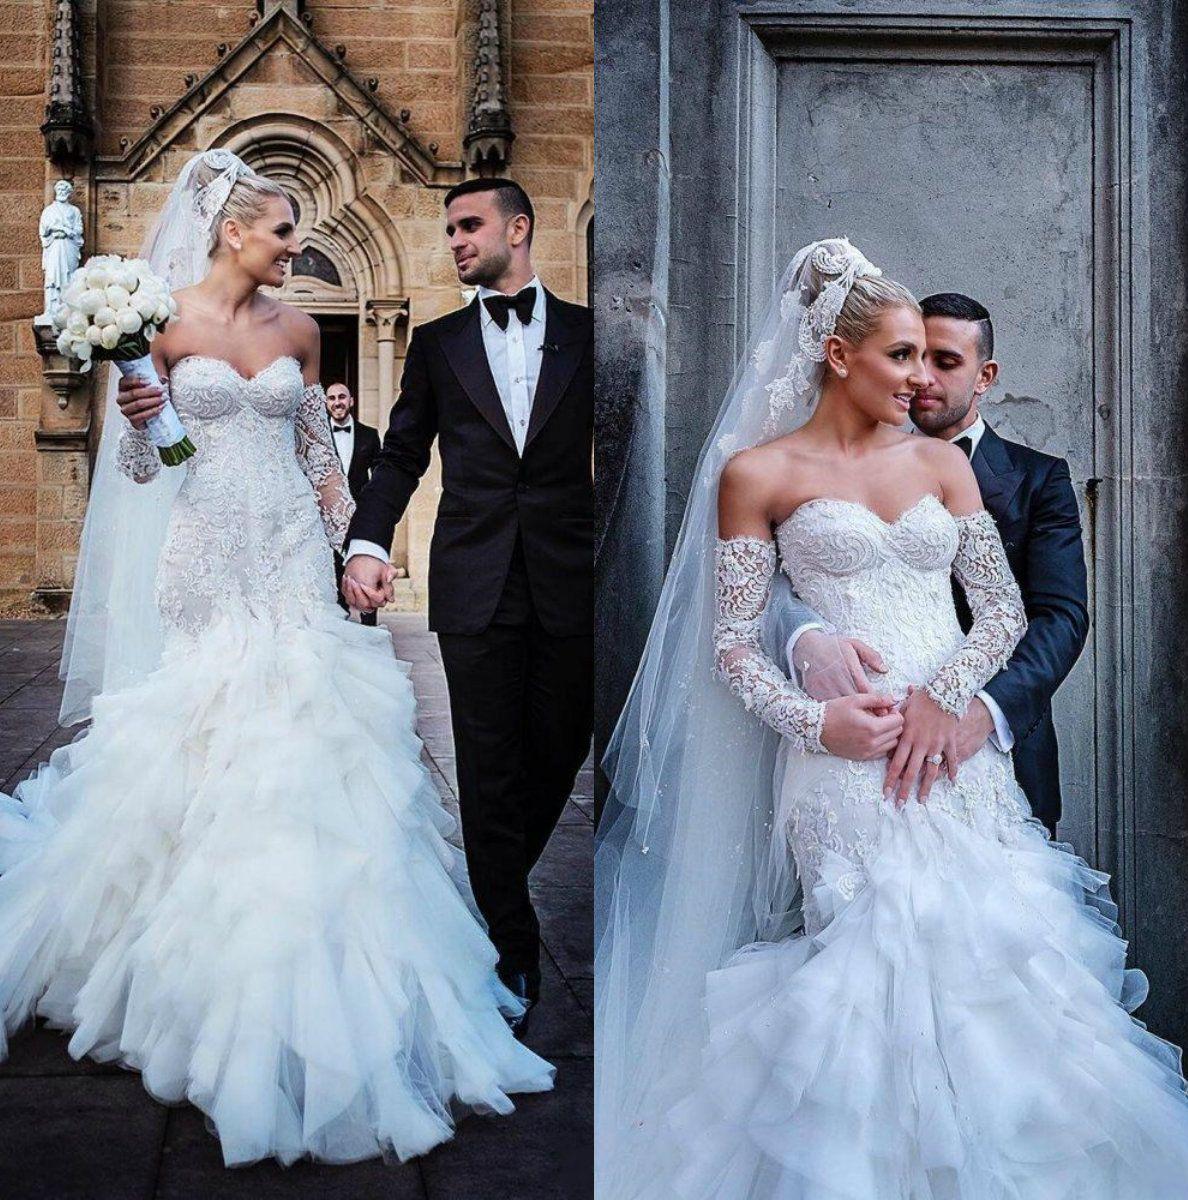 Berta 2019 Wedding Dresses Sweetheart Neck Lace Applique Bridal Gowns Tiered Tulle Floor Length Mermaid Wedding Dress Vestidos De Noiva